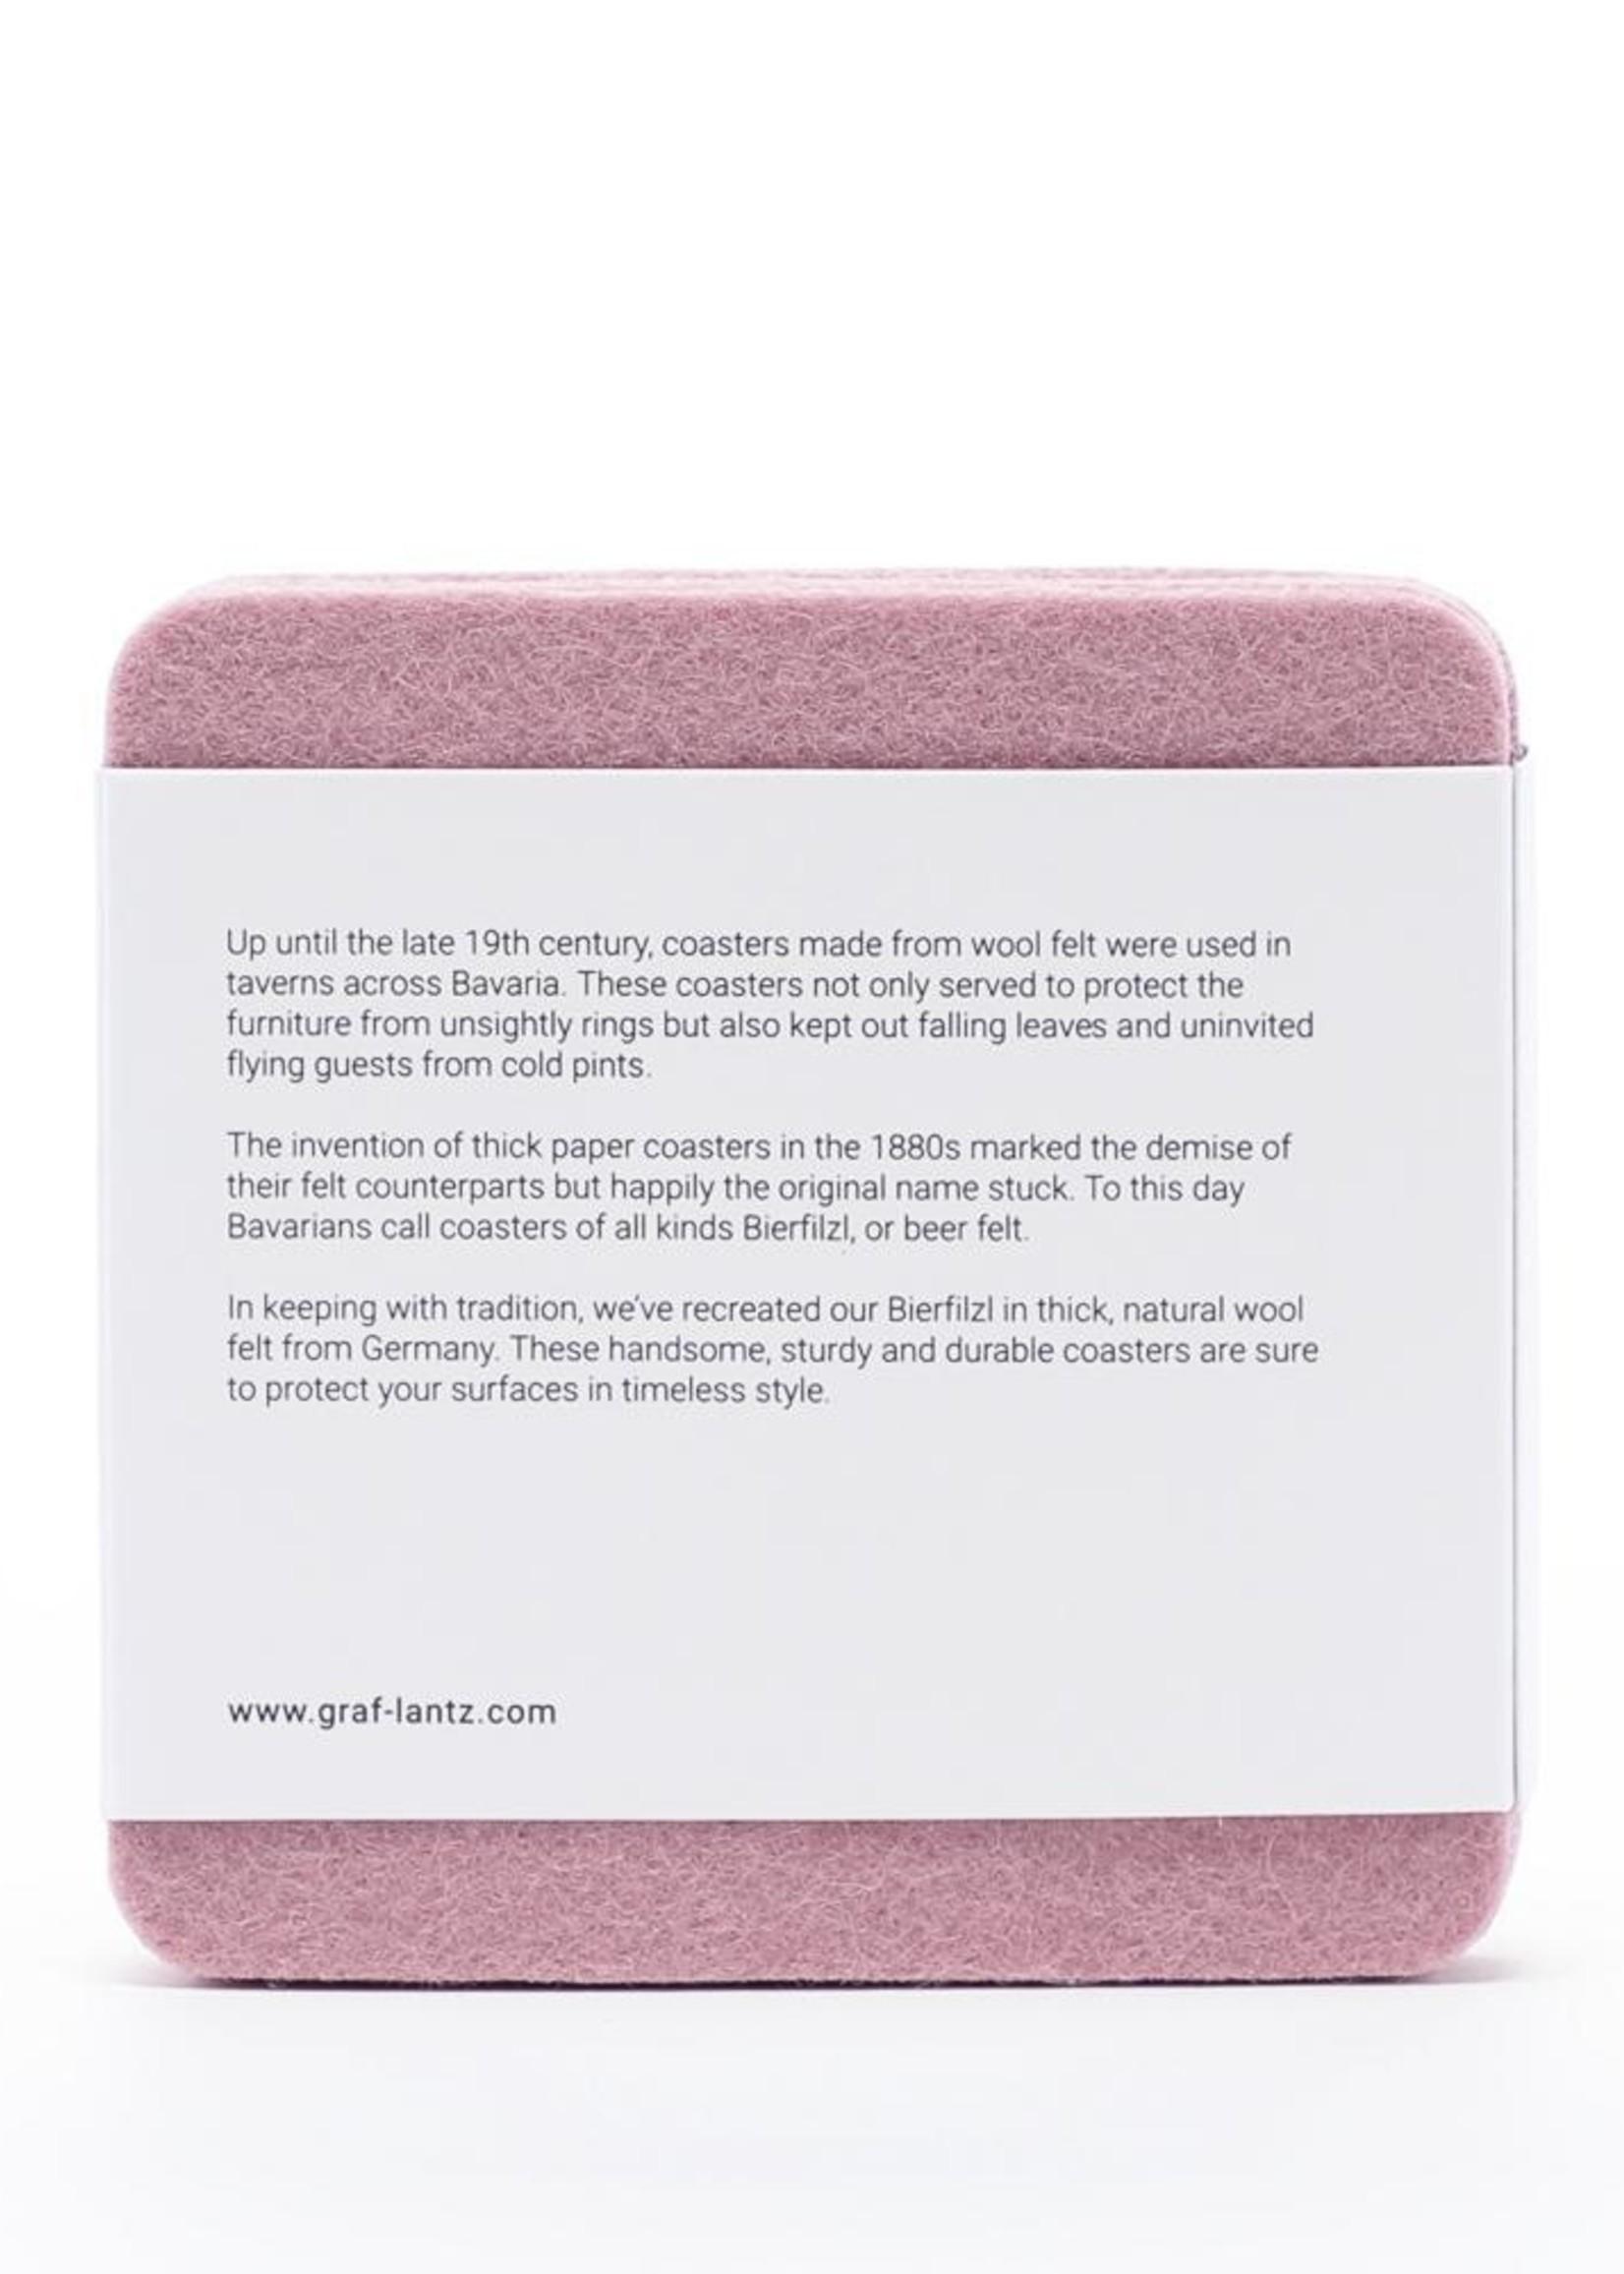 Graf&Lantz Bierfilzl Square Felt Coaster 4 Pack - Rouge